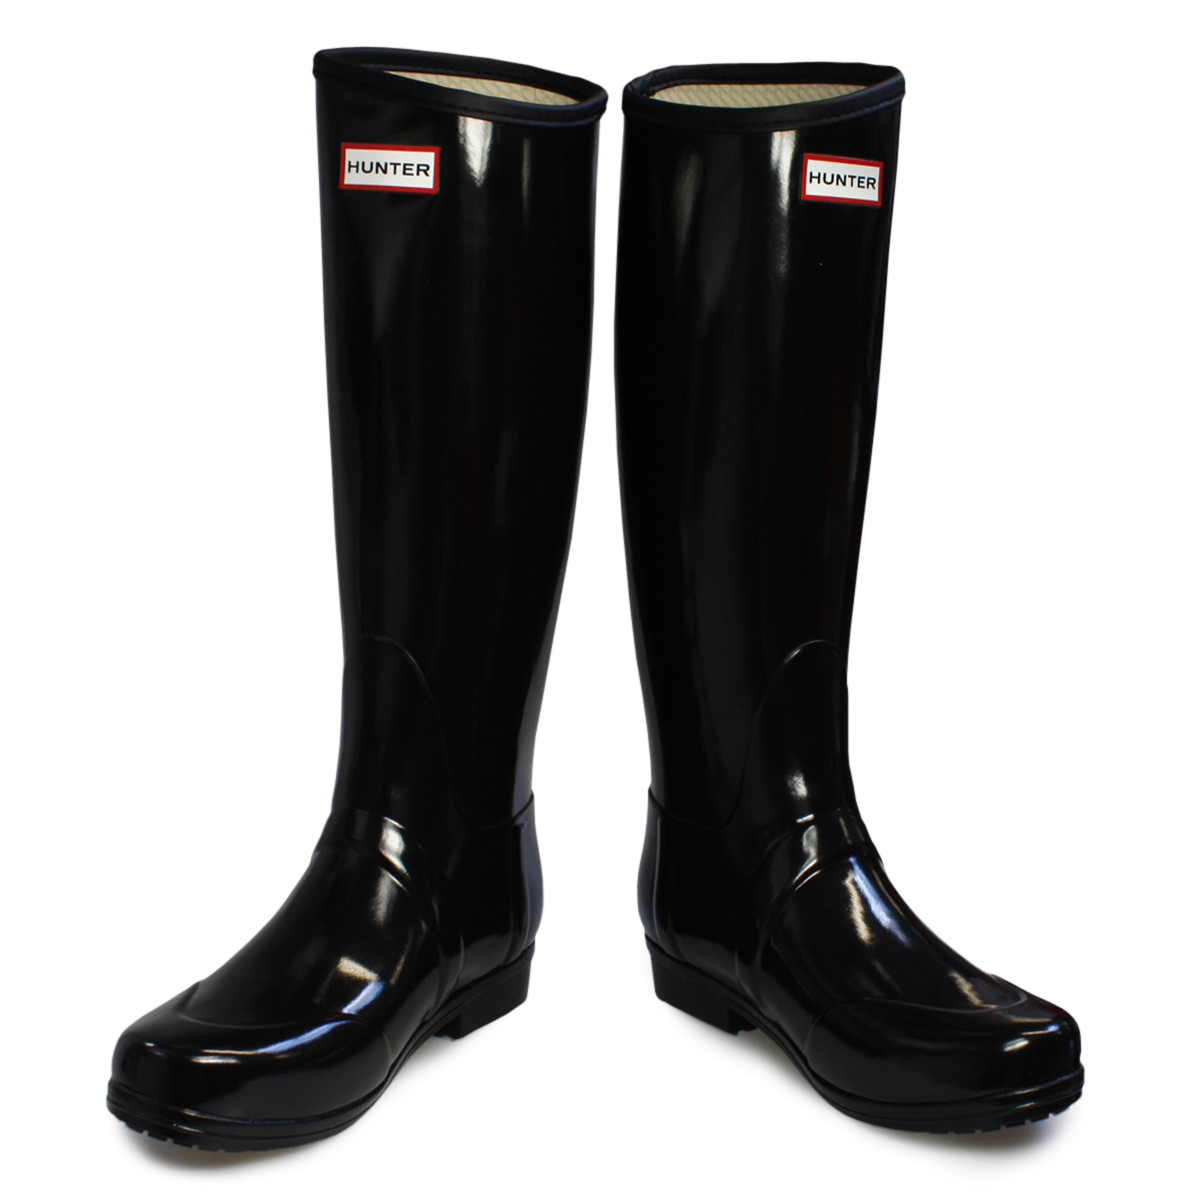 Luxury Hunter Wellies Original Tall Women Black Rubber Boots | EBay